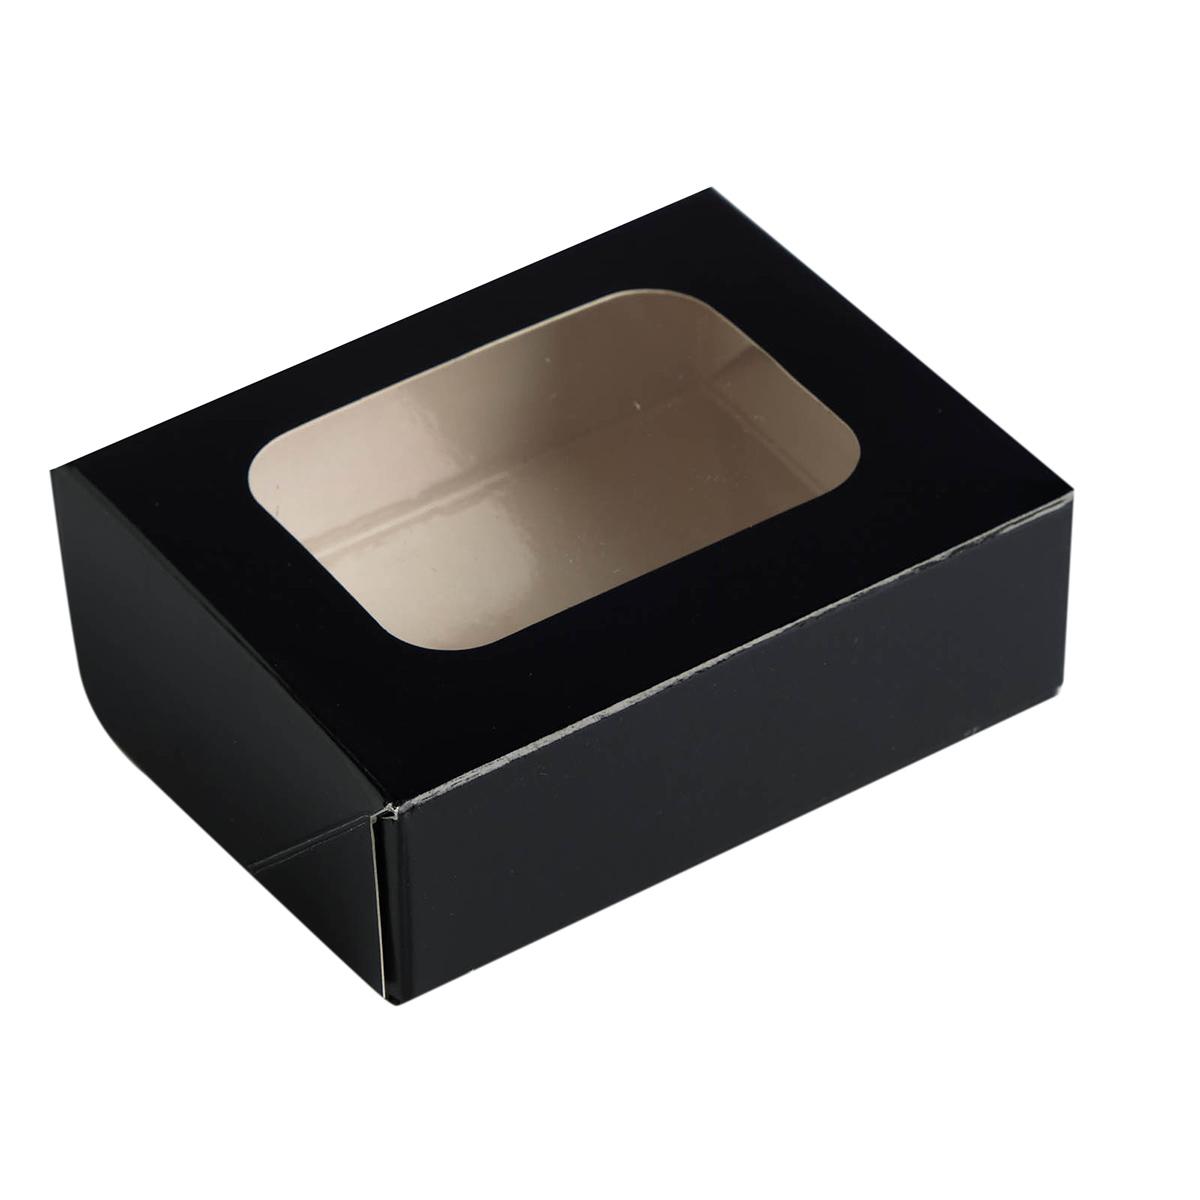 4439915 Контейнер картон, чёрный, 10*8*3,5 см